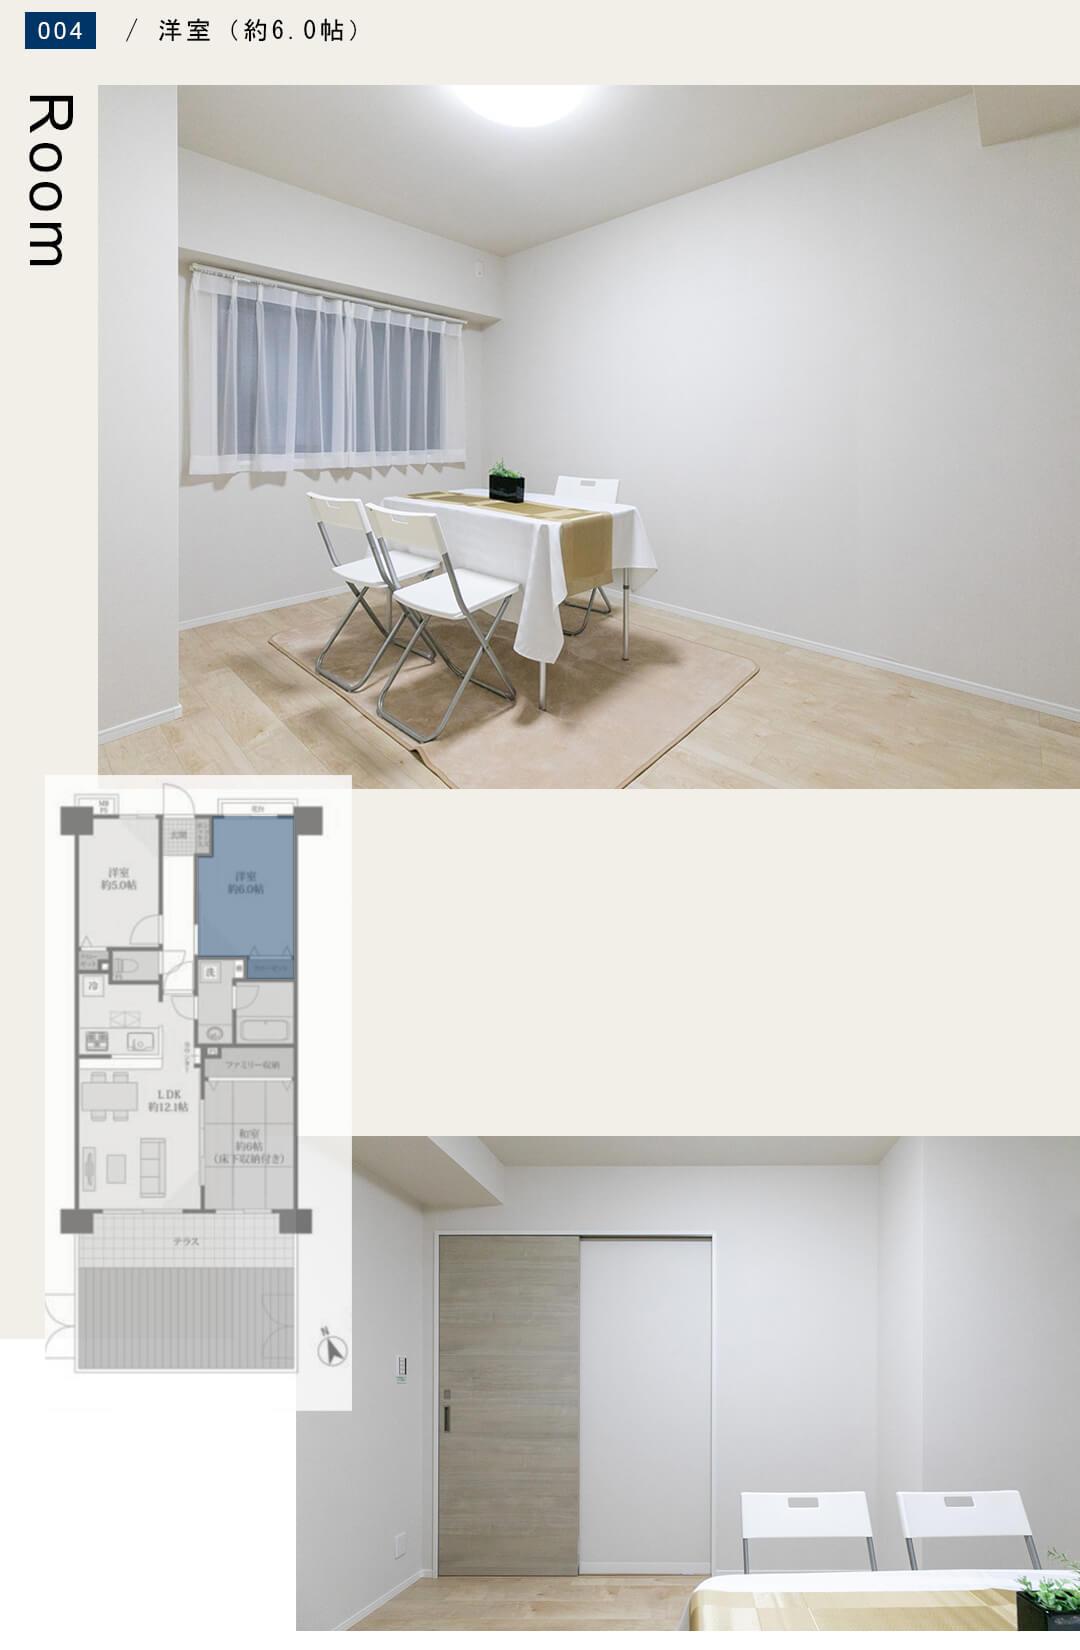 004洋室(約6.0帖),Room